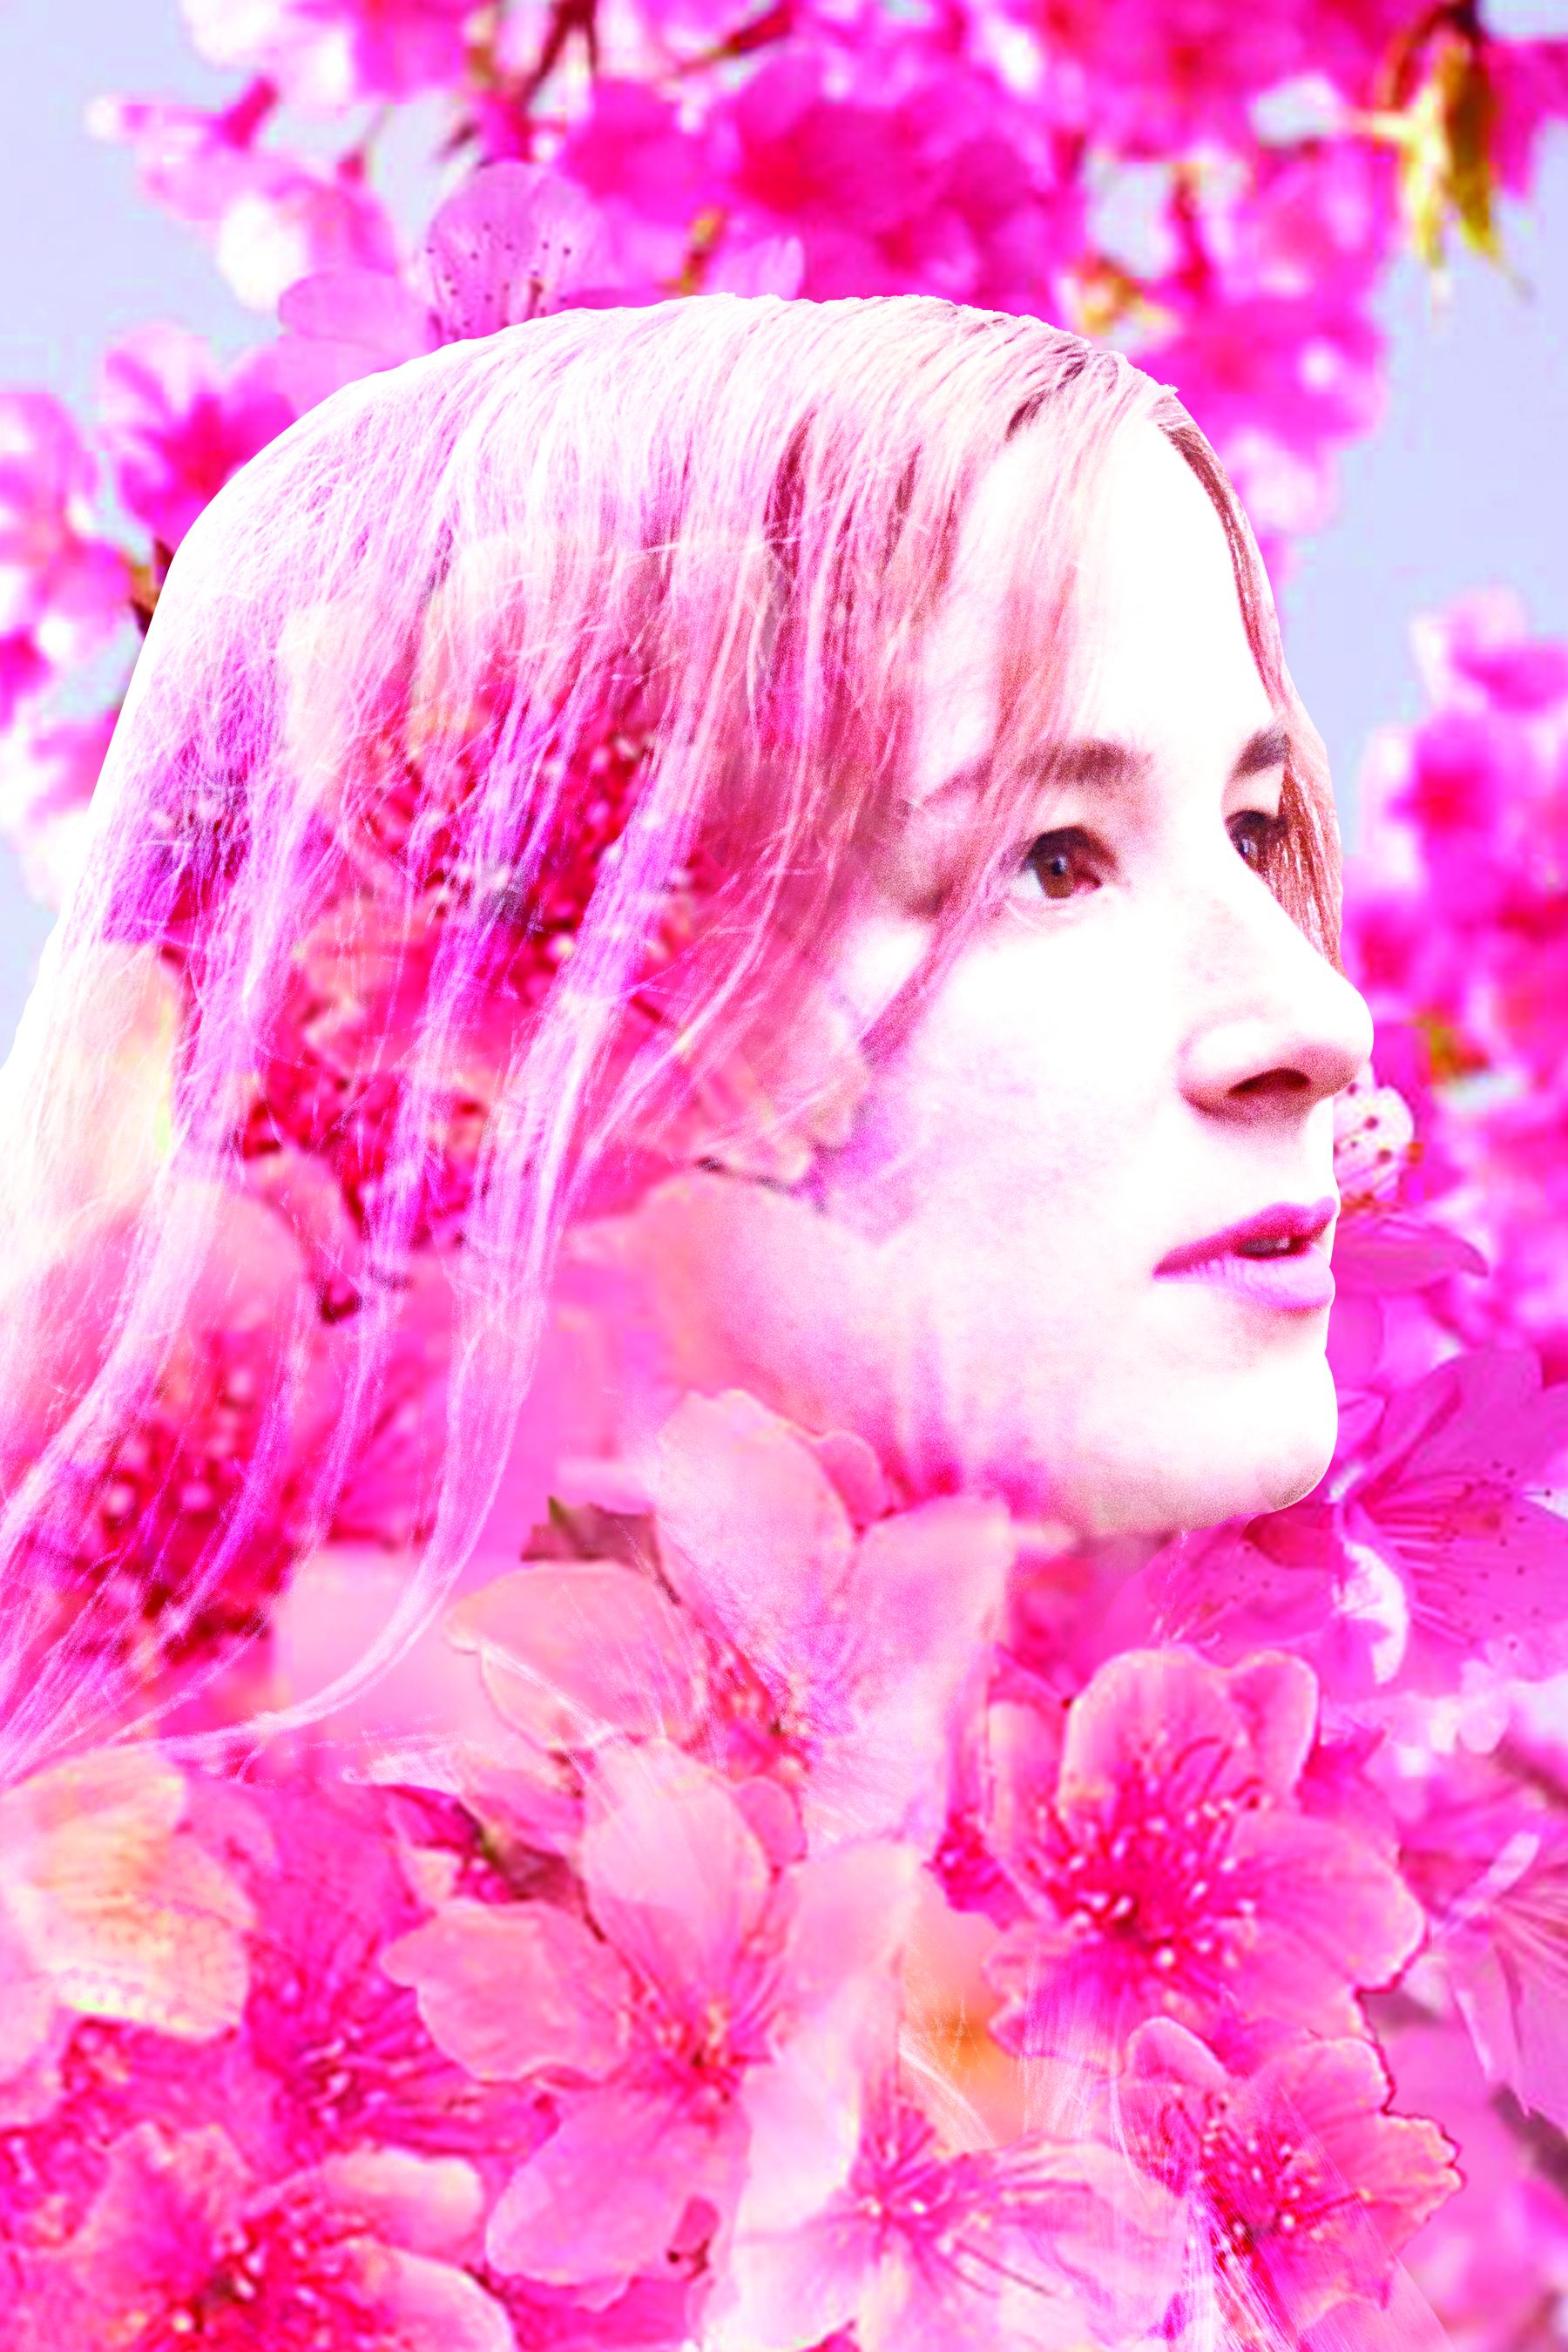 Ashley Shadow || Photography by Sara Baar for Discorder Magazine